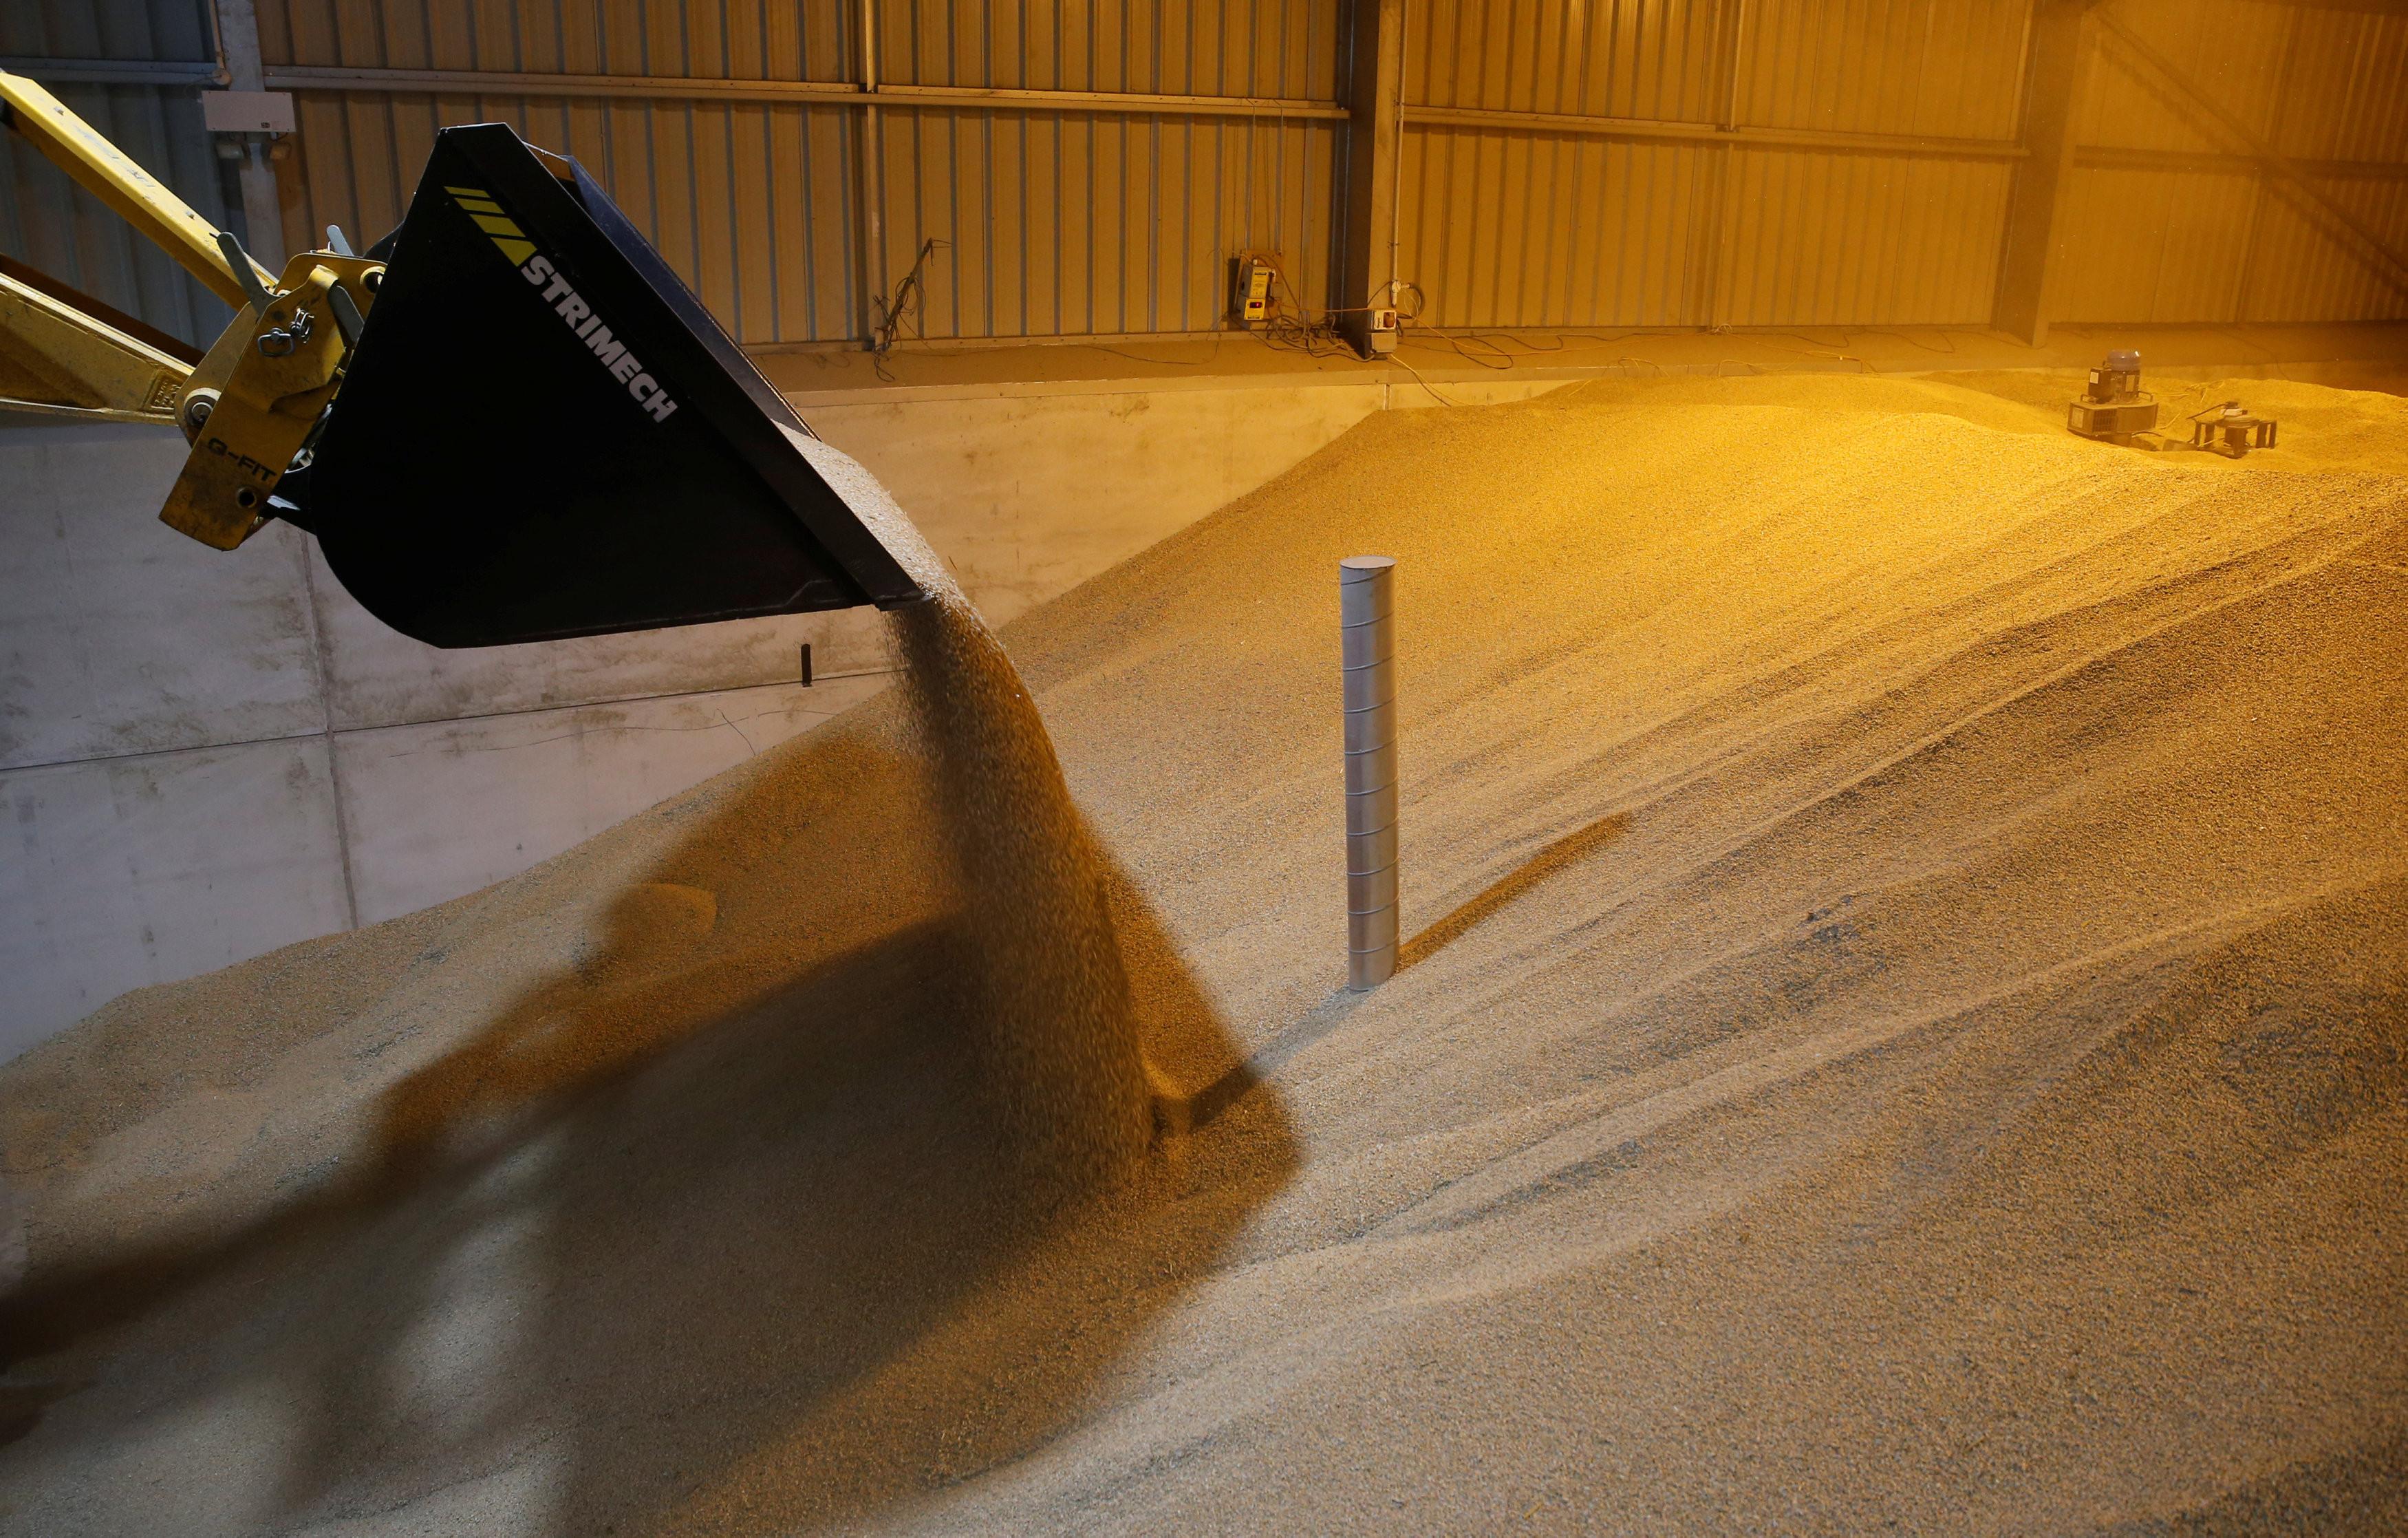 <p>Зерно пшеницы. Фото: &copy; REUTERS/Peter Cziborra</p>